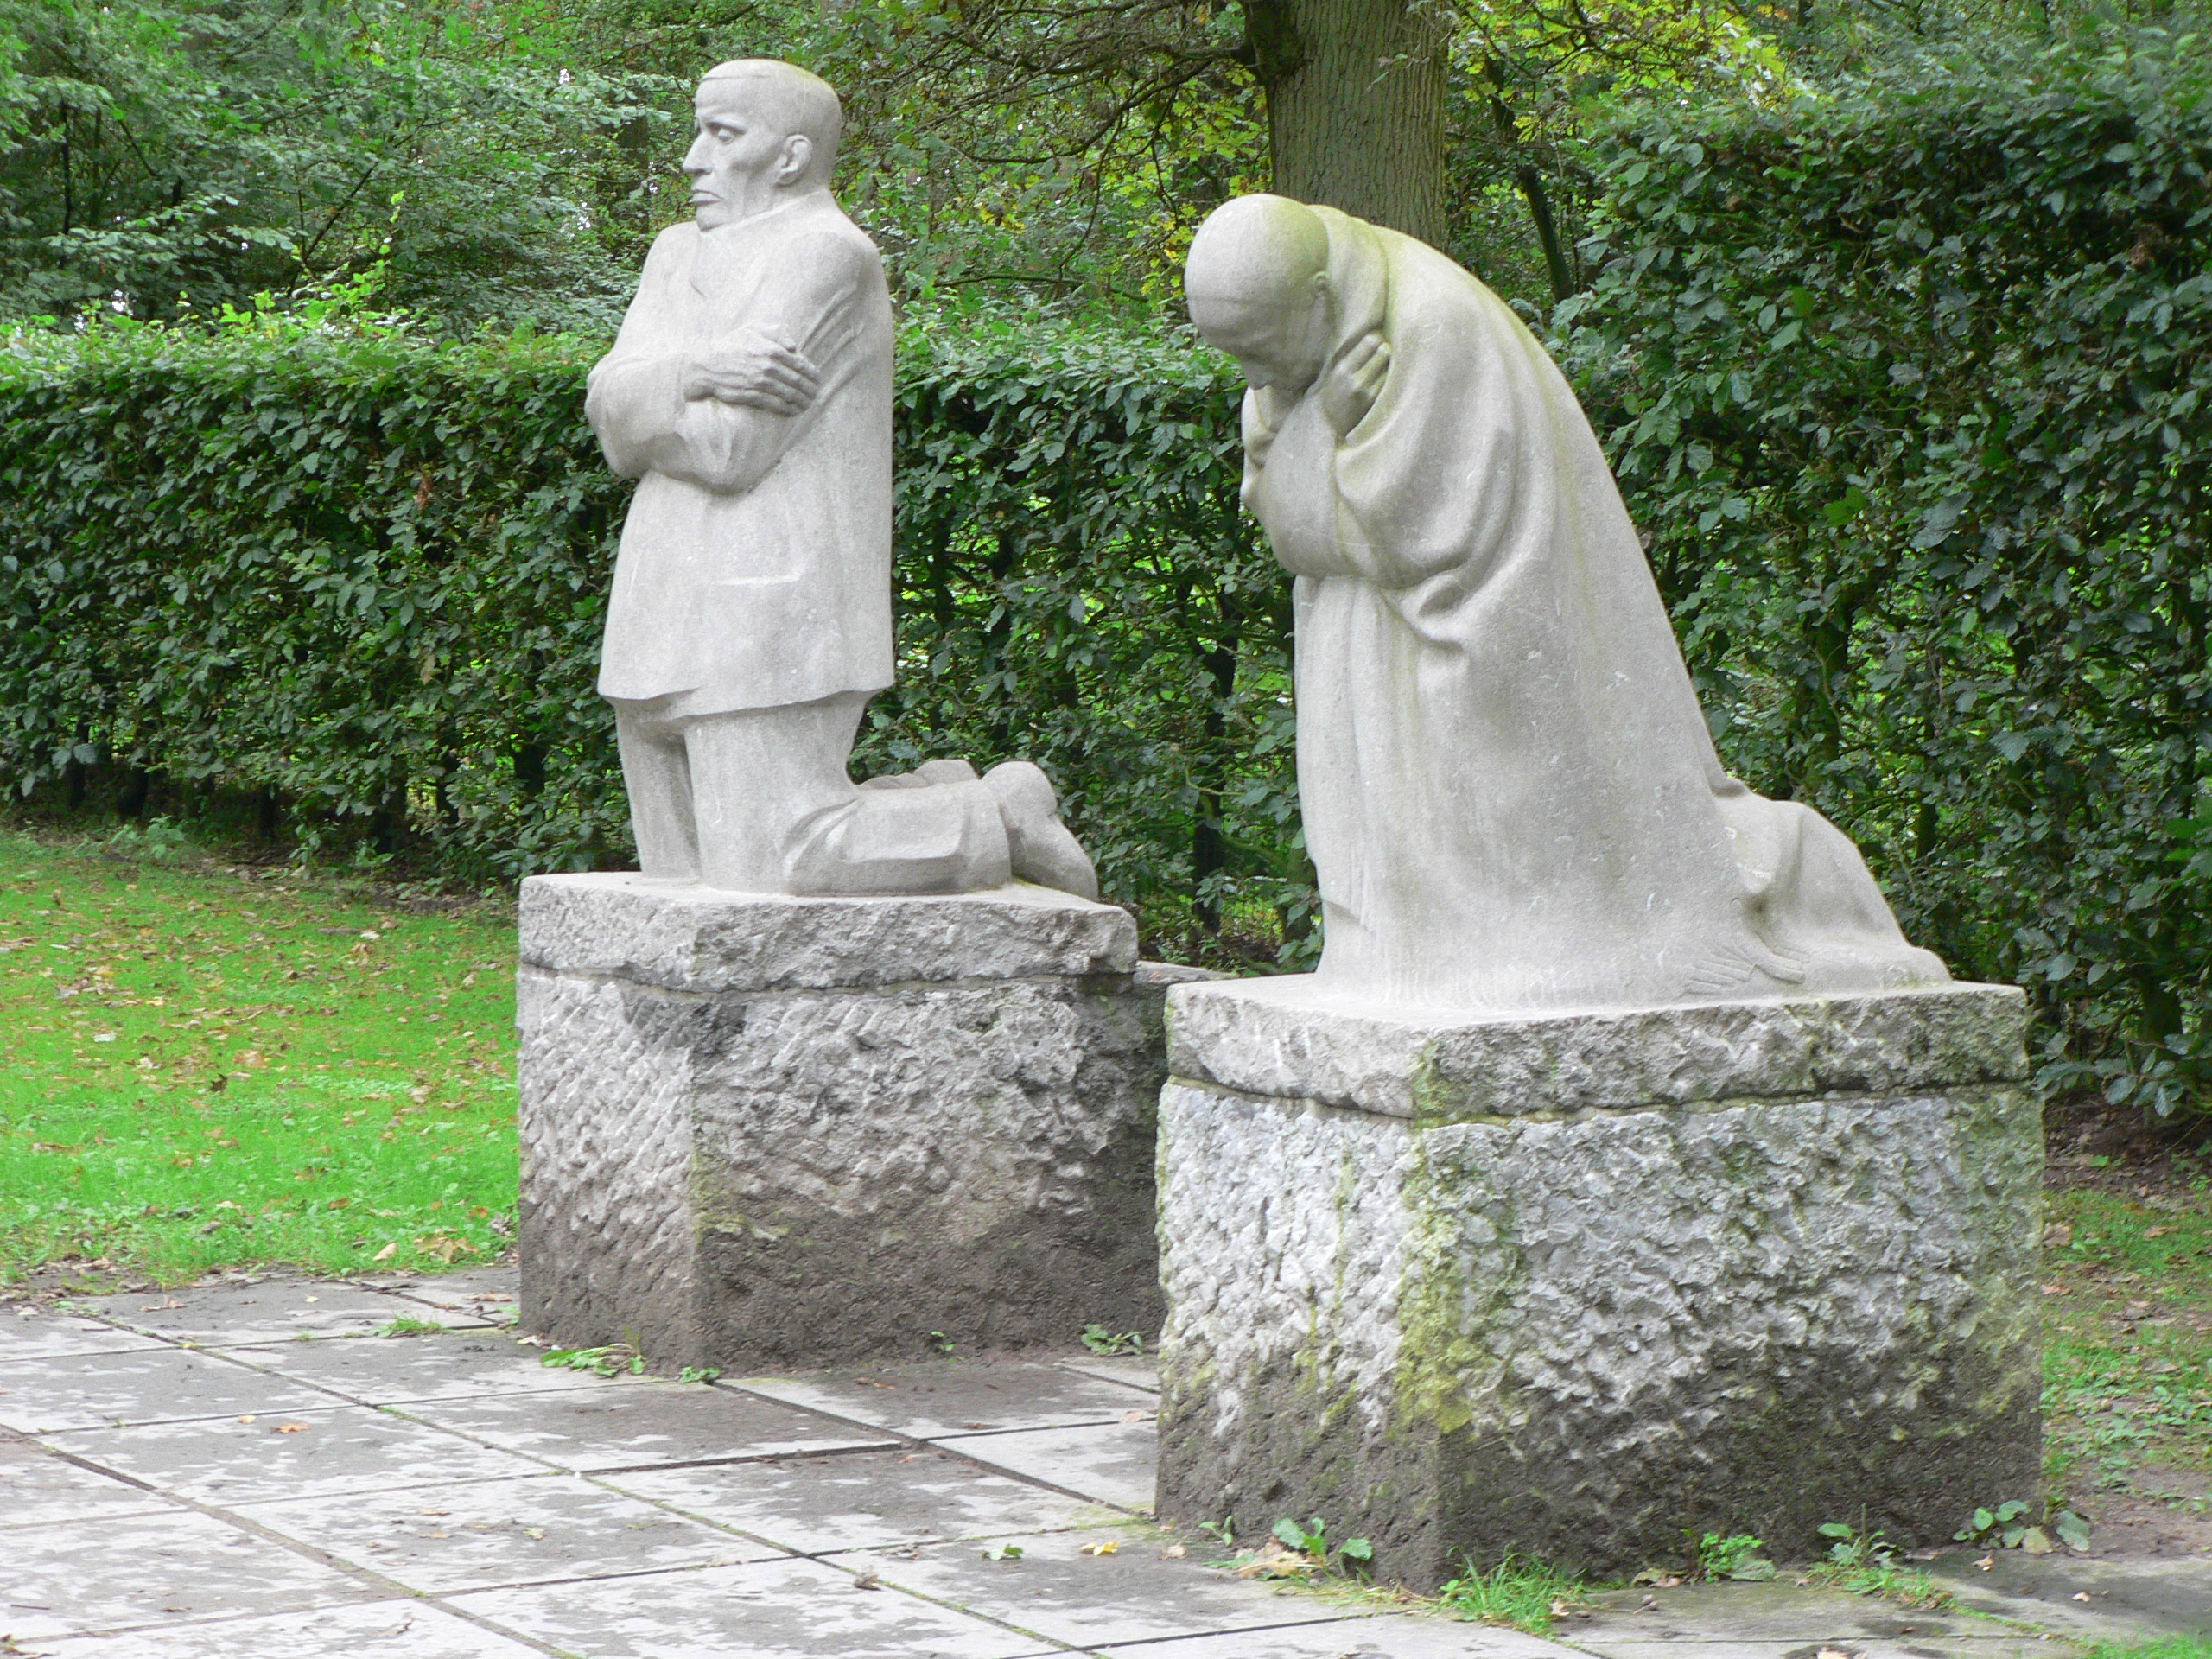 The Grieving Parents - Käthe Kollwitz - 1932 - for her son Peter, killed in World War I - Vladslo German War Cemetery, Belgium (pubic domain)